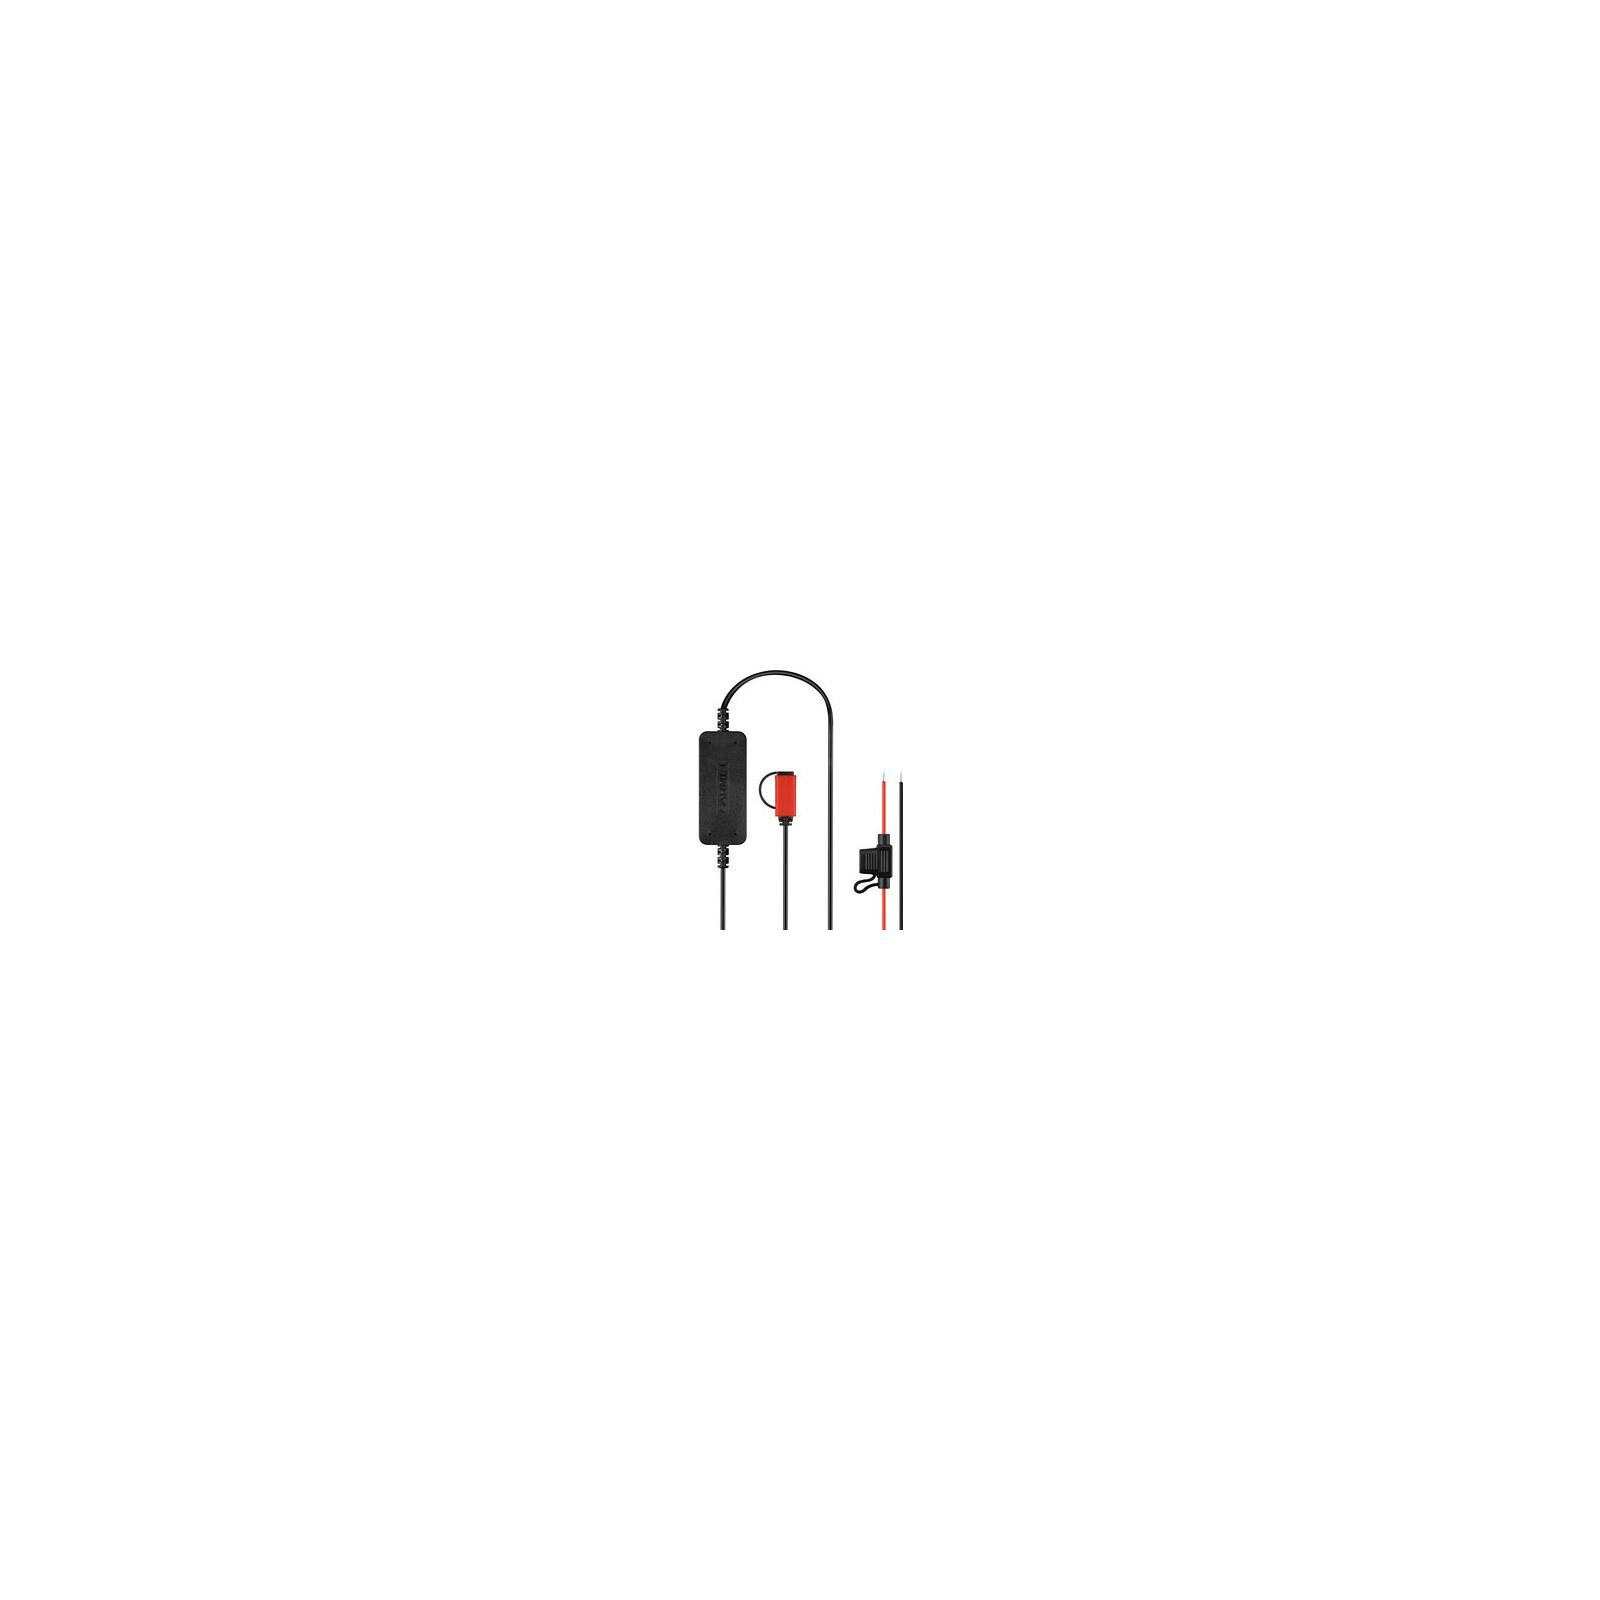 Garmin Virb X/XE/Ultra USB Netzkabel mit freien Drahtenden